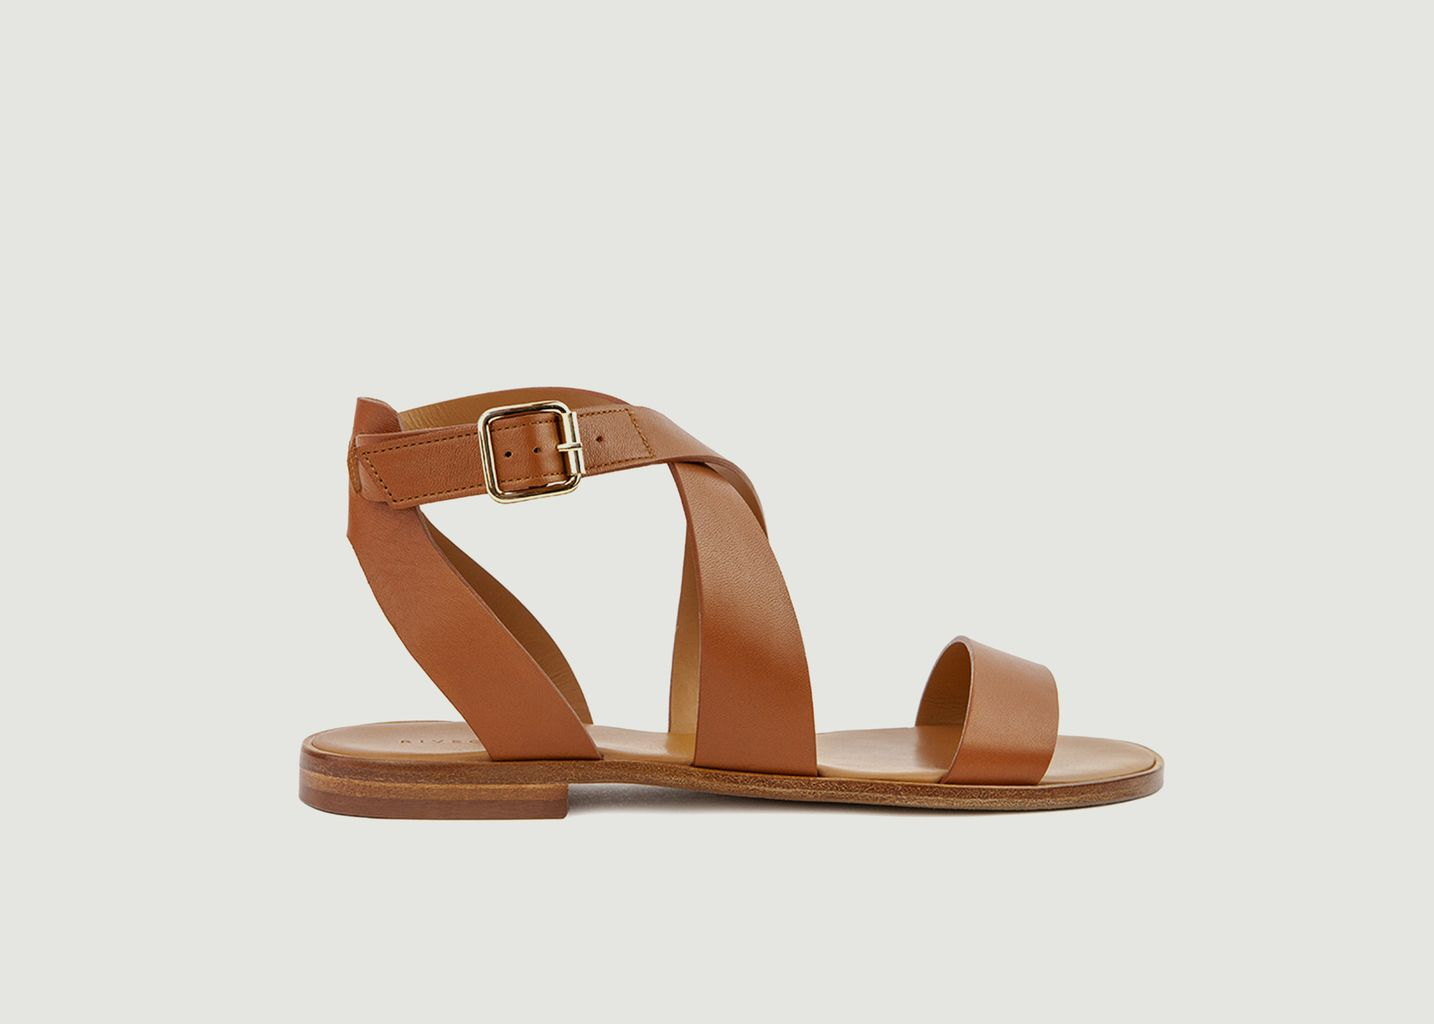 Sandales plates en cuir N°202 - Rivecour